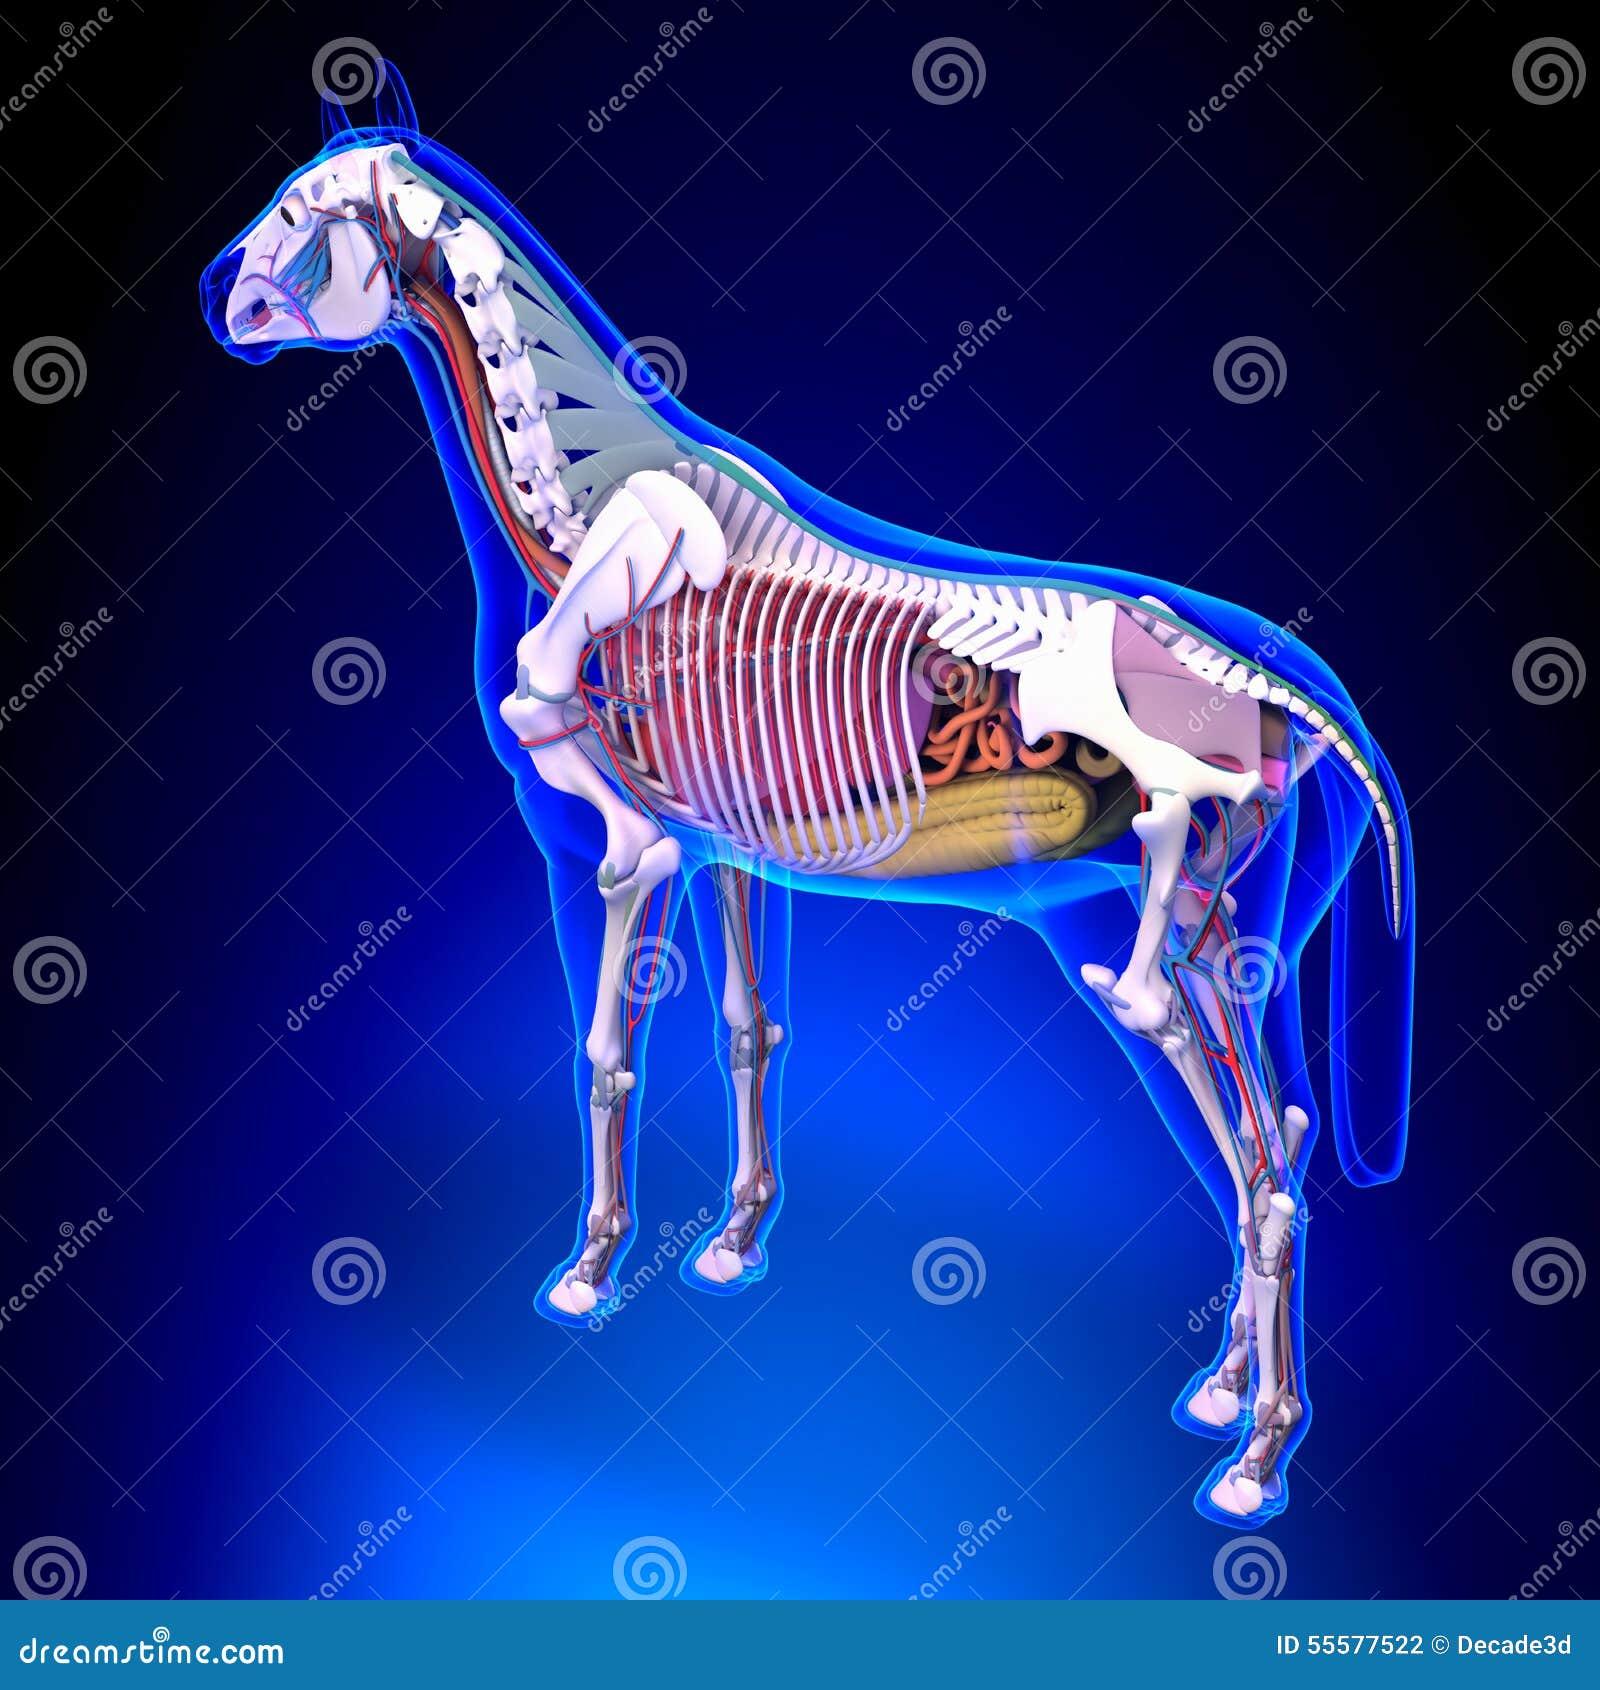 Horse Anatomy - Internal Anatomy Of Horse Back View On Blue Back ...